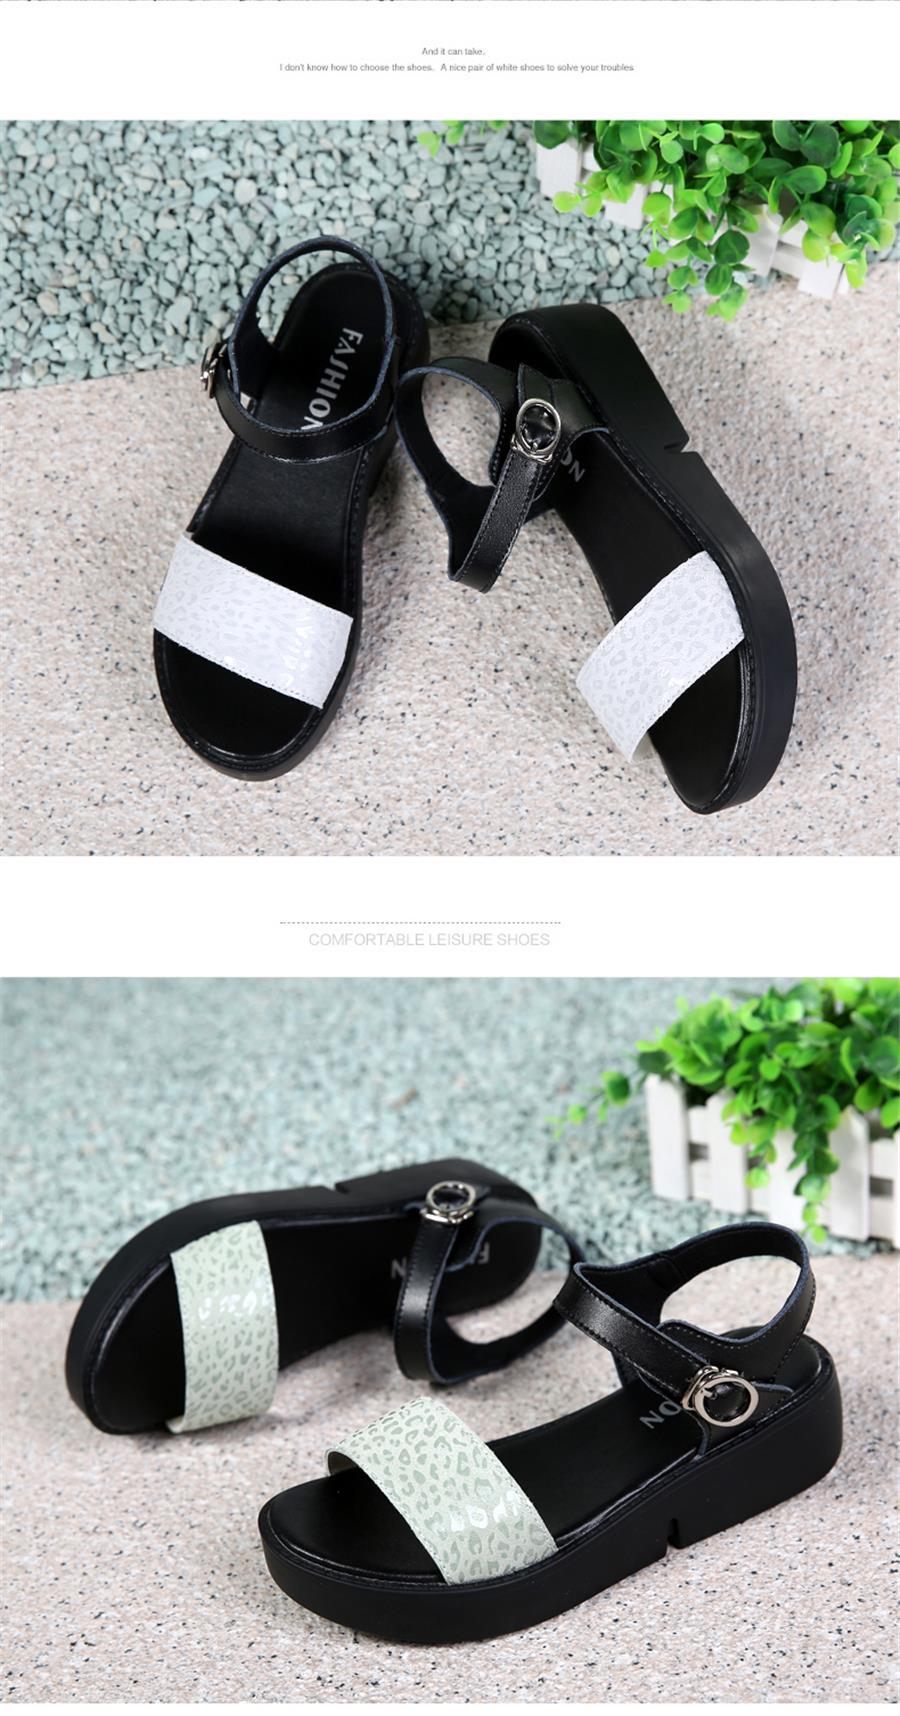 b57d1b6588395 STQ 2019 women platform sandals suede leather flat sandals Low Wedges  Summer female Sandalias ladies gladiator sandals 8631USD 29.99-33.29 pair